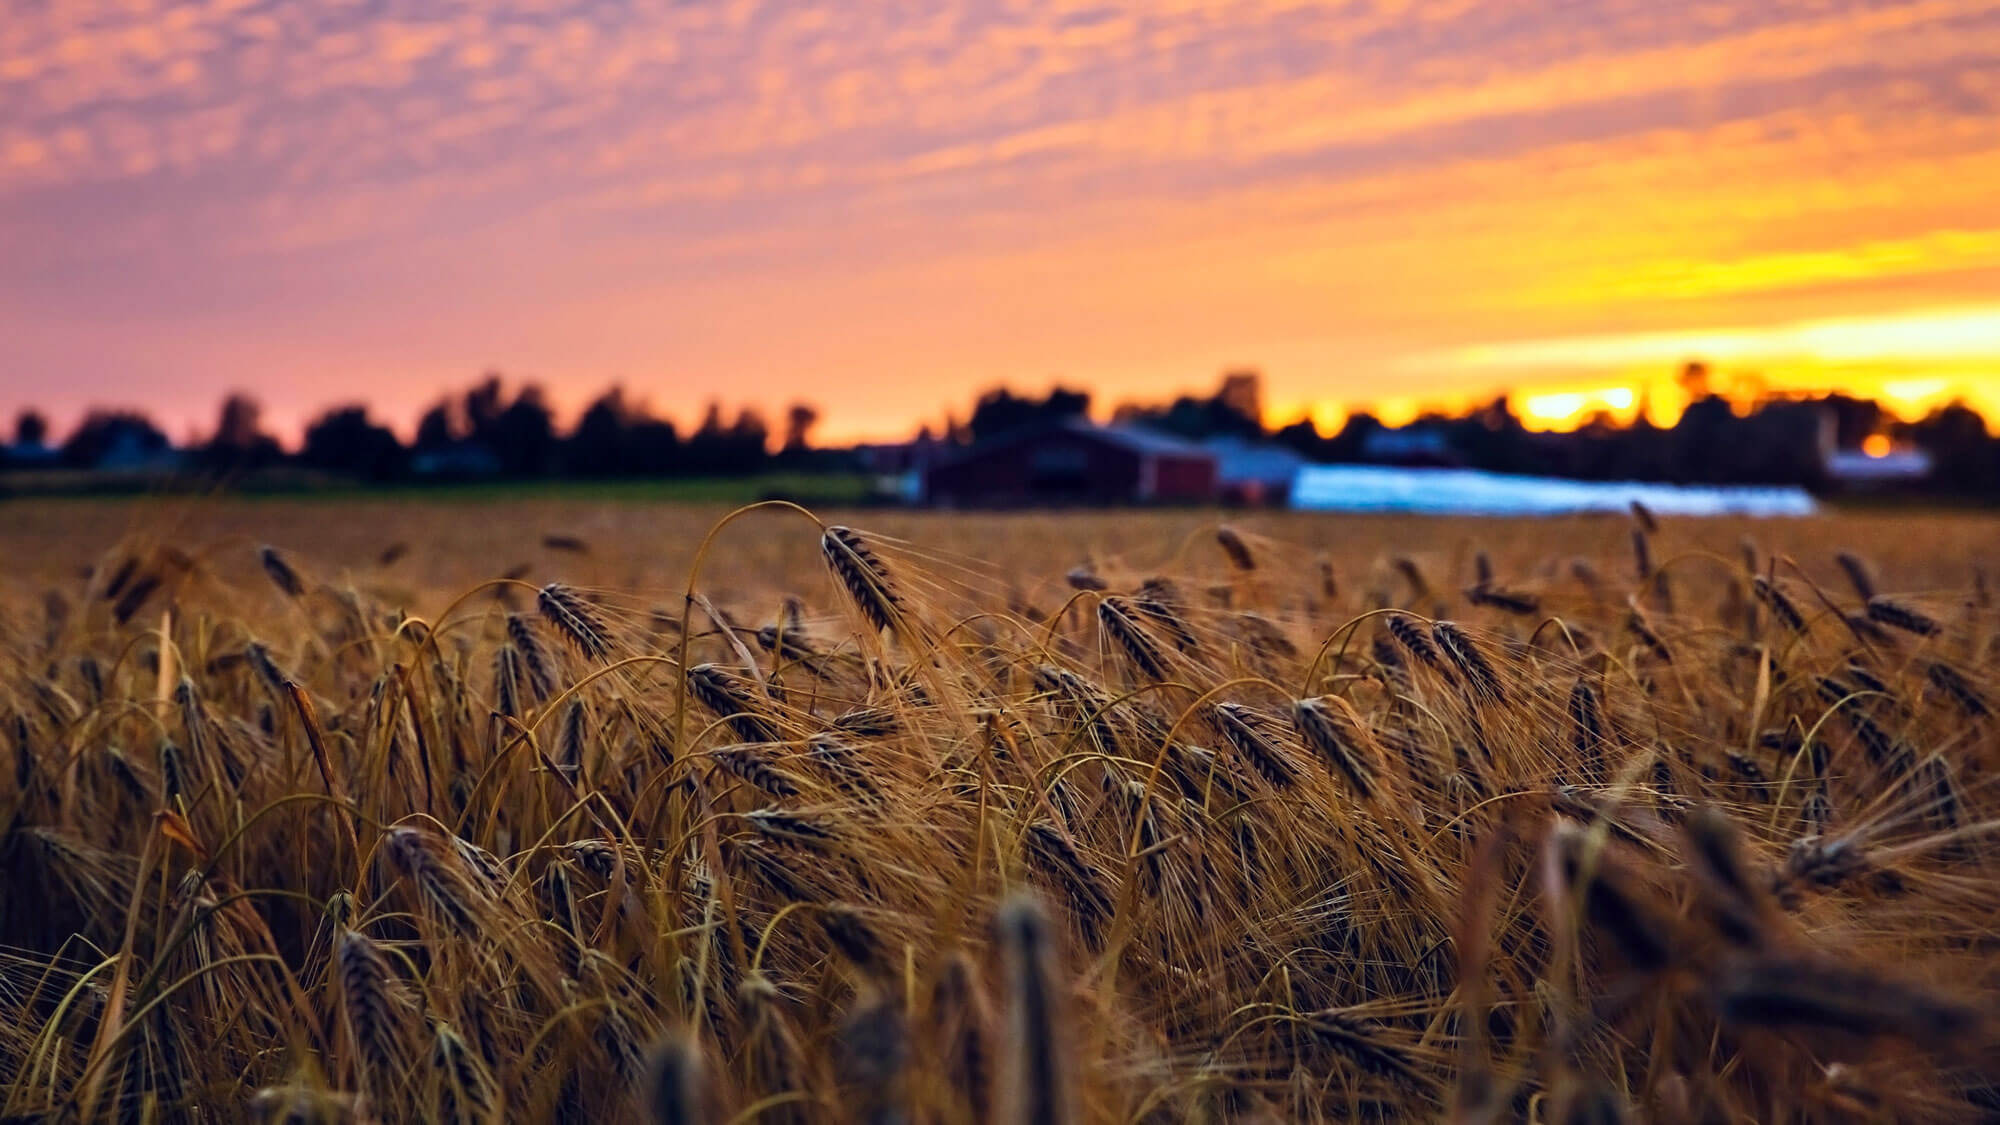 Seasonal crop rotation is key to sustainable farming